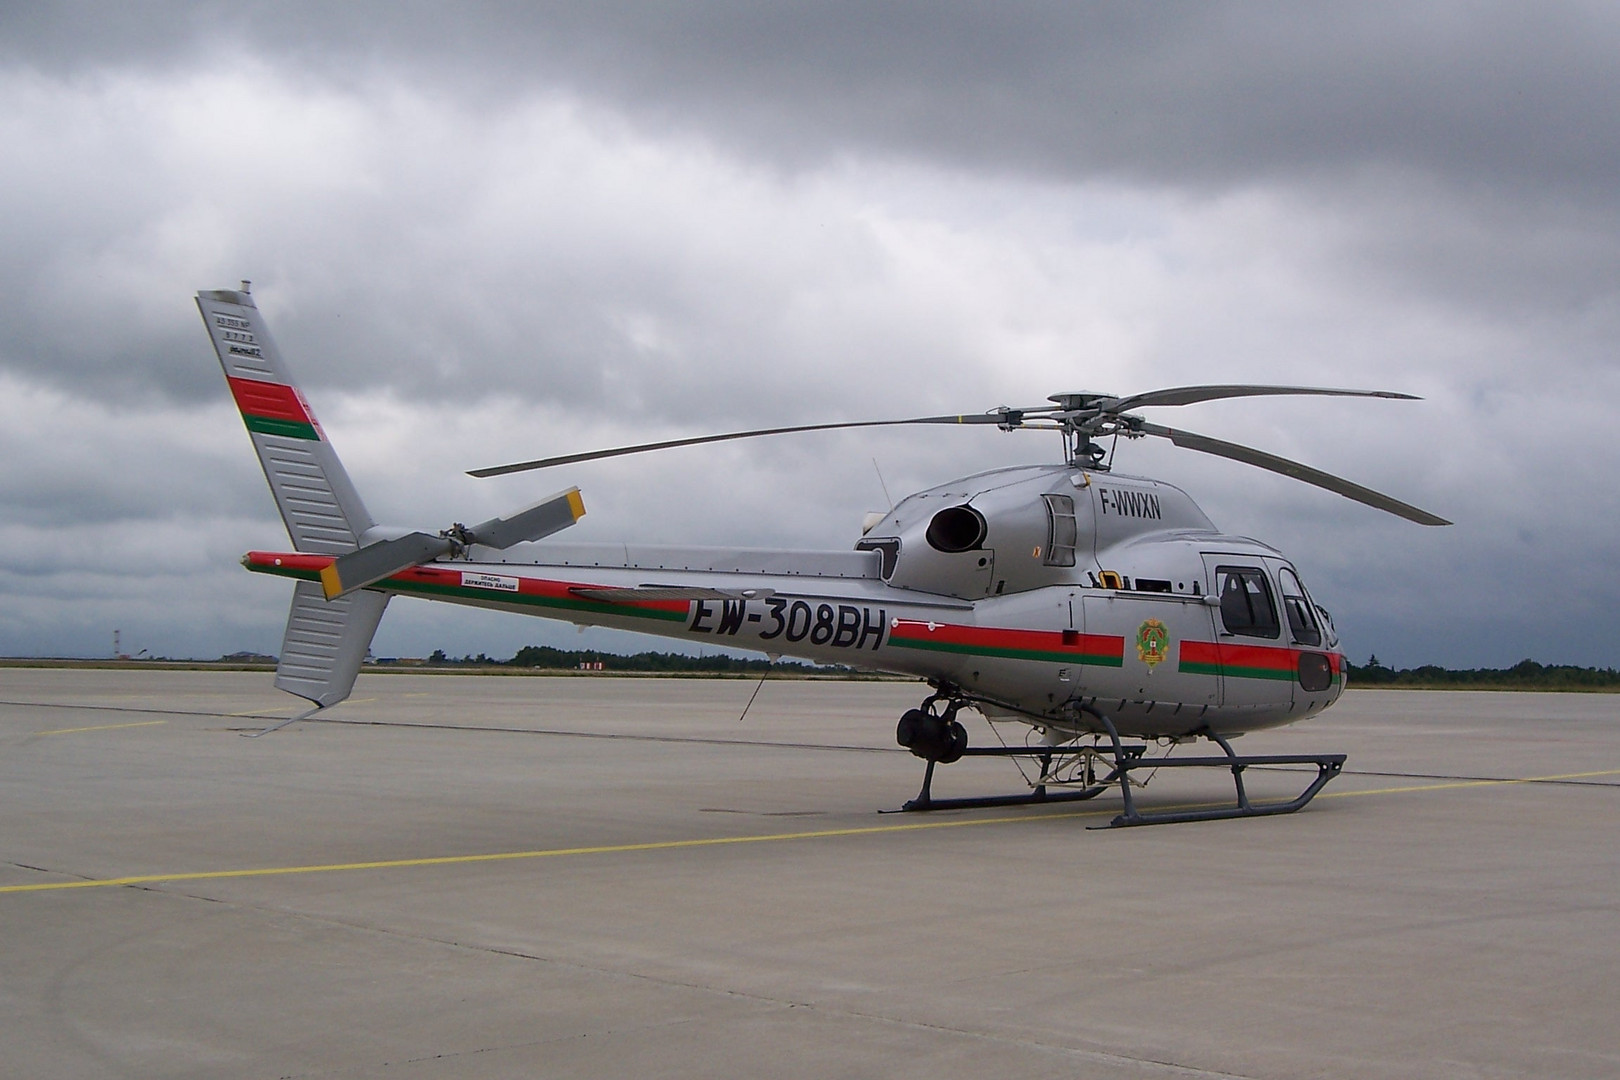 EW-308BH alias F-WWXN